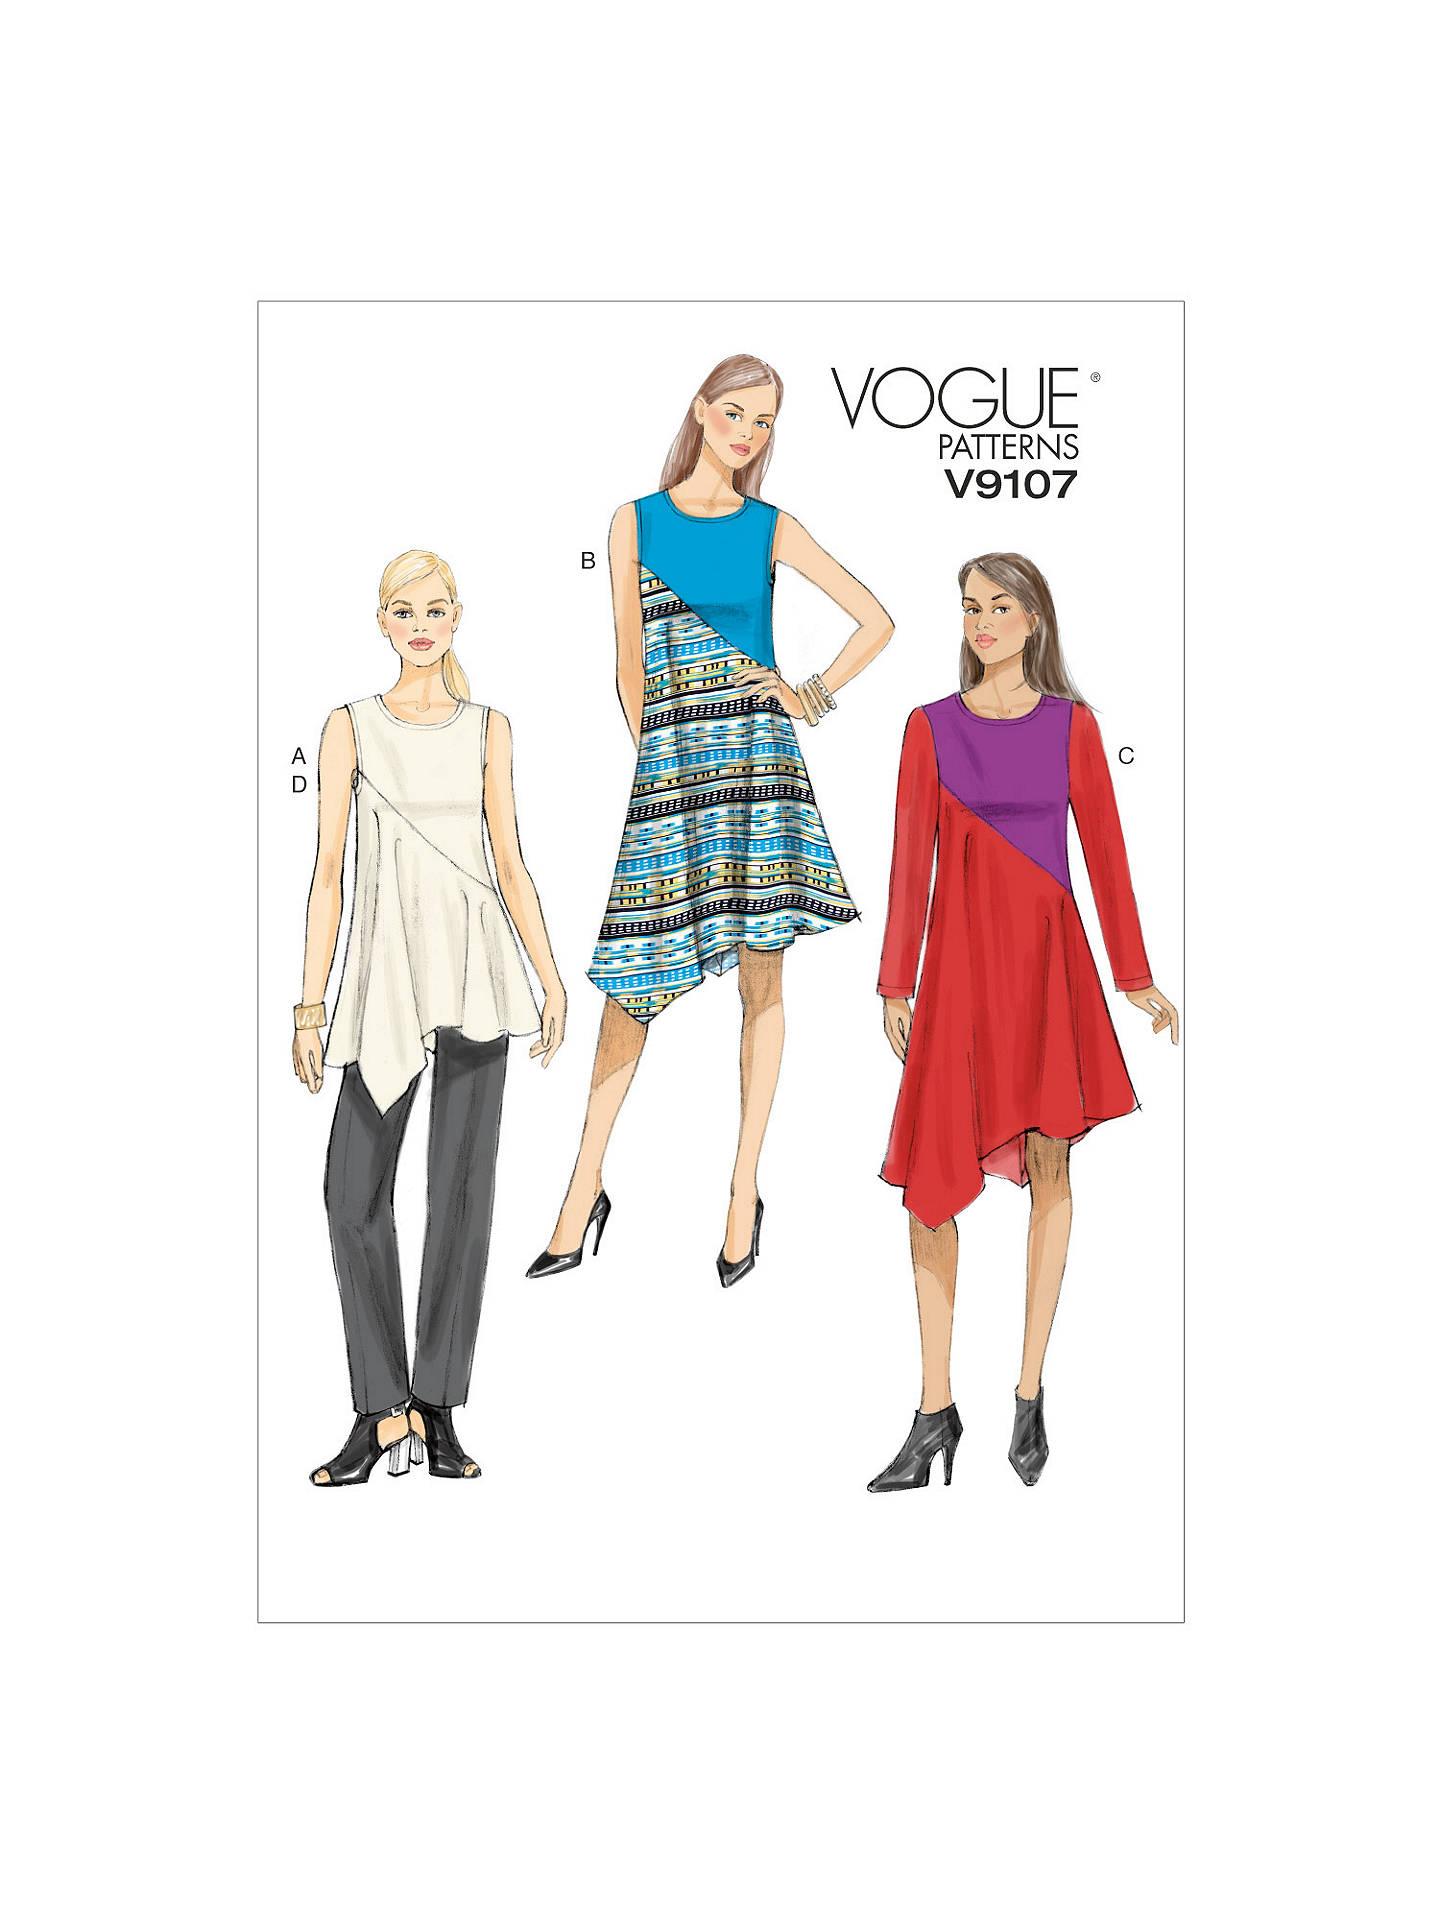 Vogue Women\'s Asymmetric Tunic, Dress and Trousers Sewing Pattern ...